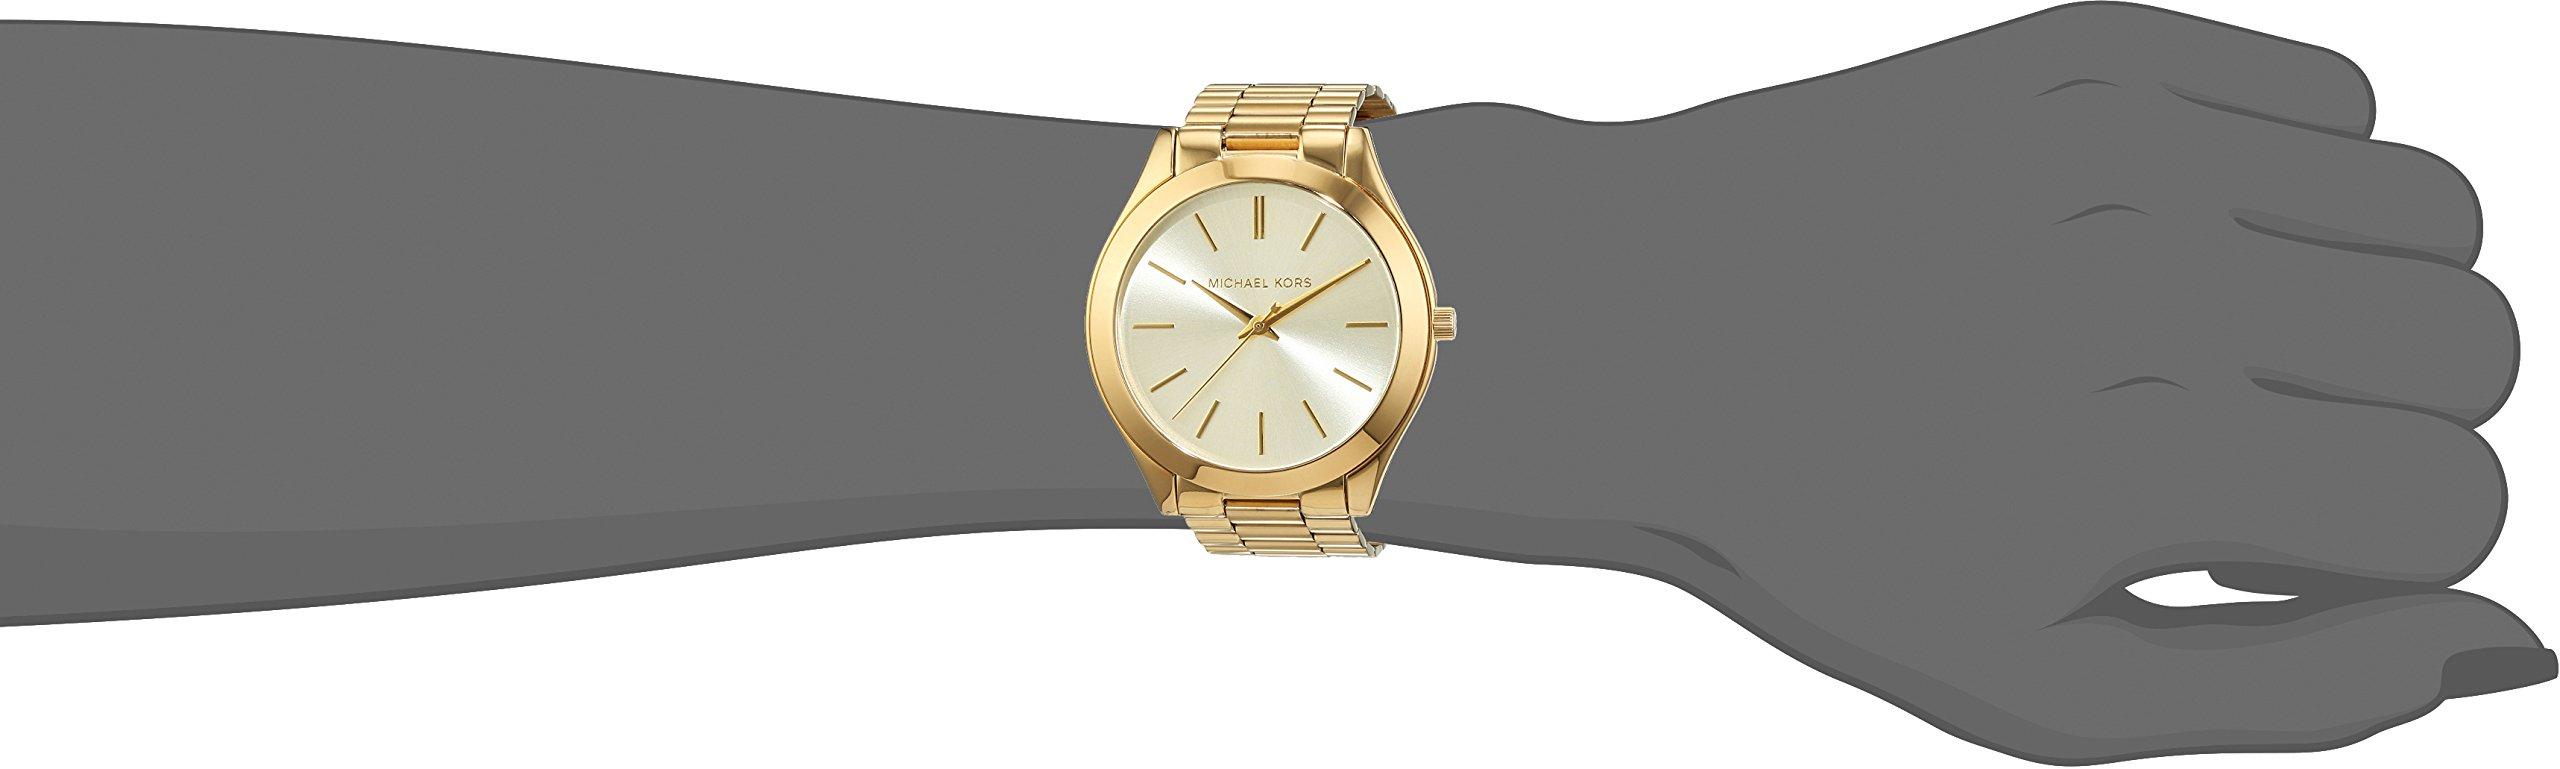 4c17690a3040 Michael Kors Women s Runway Gold-Tone Watch MK3179